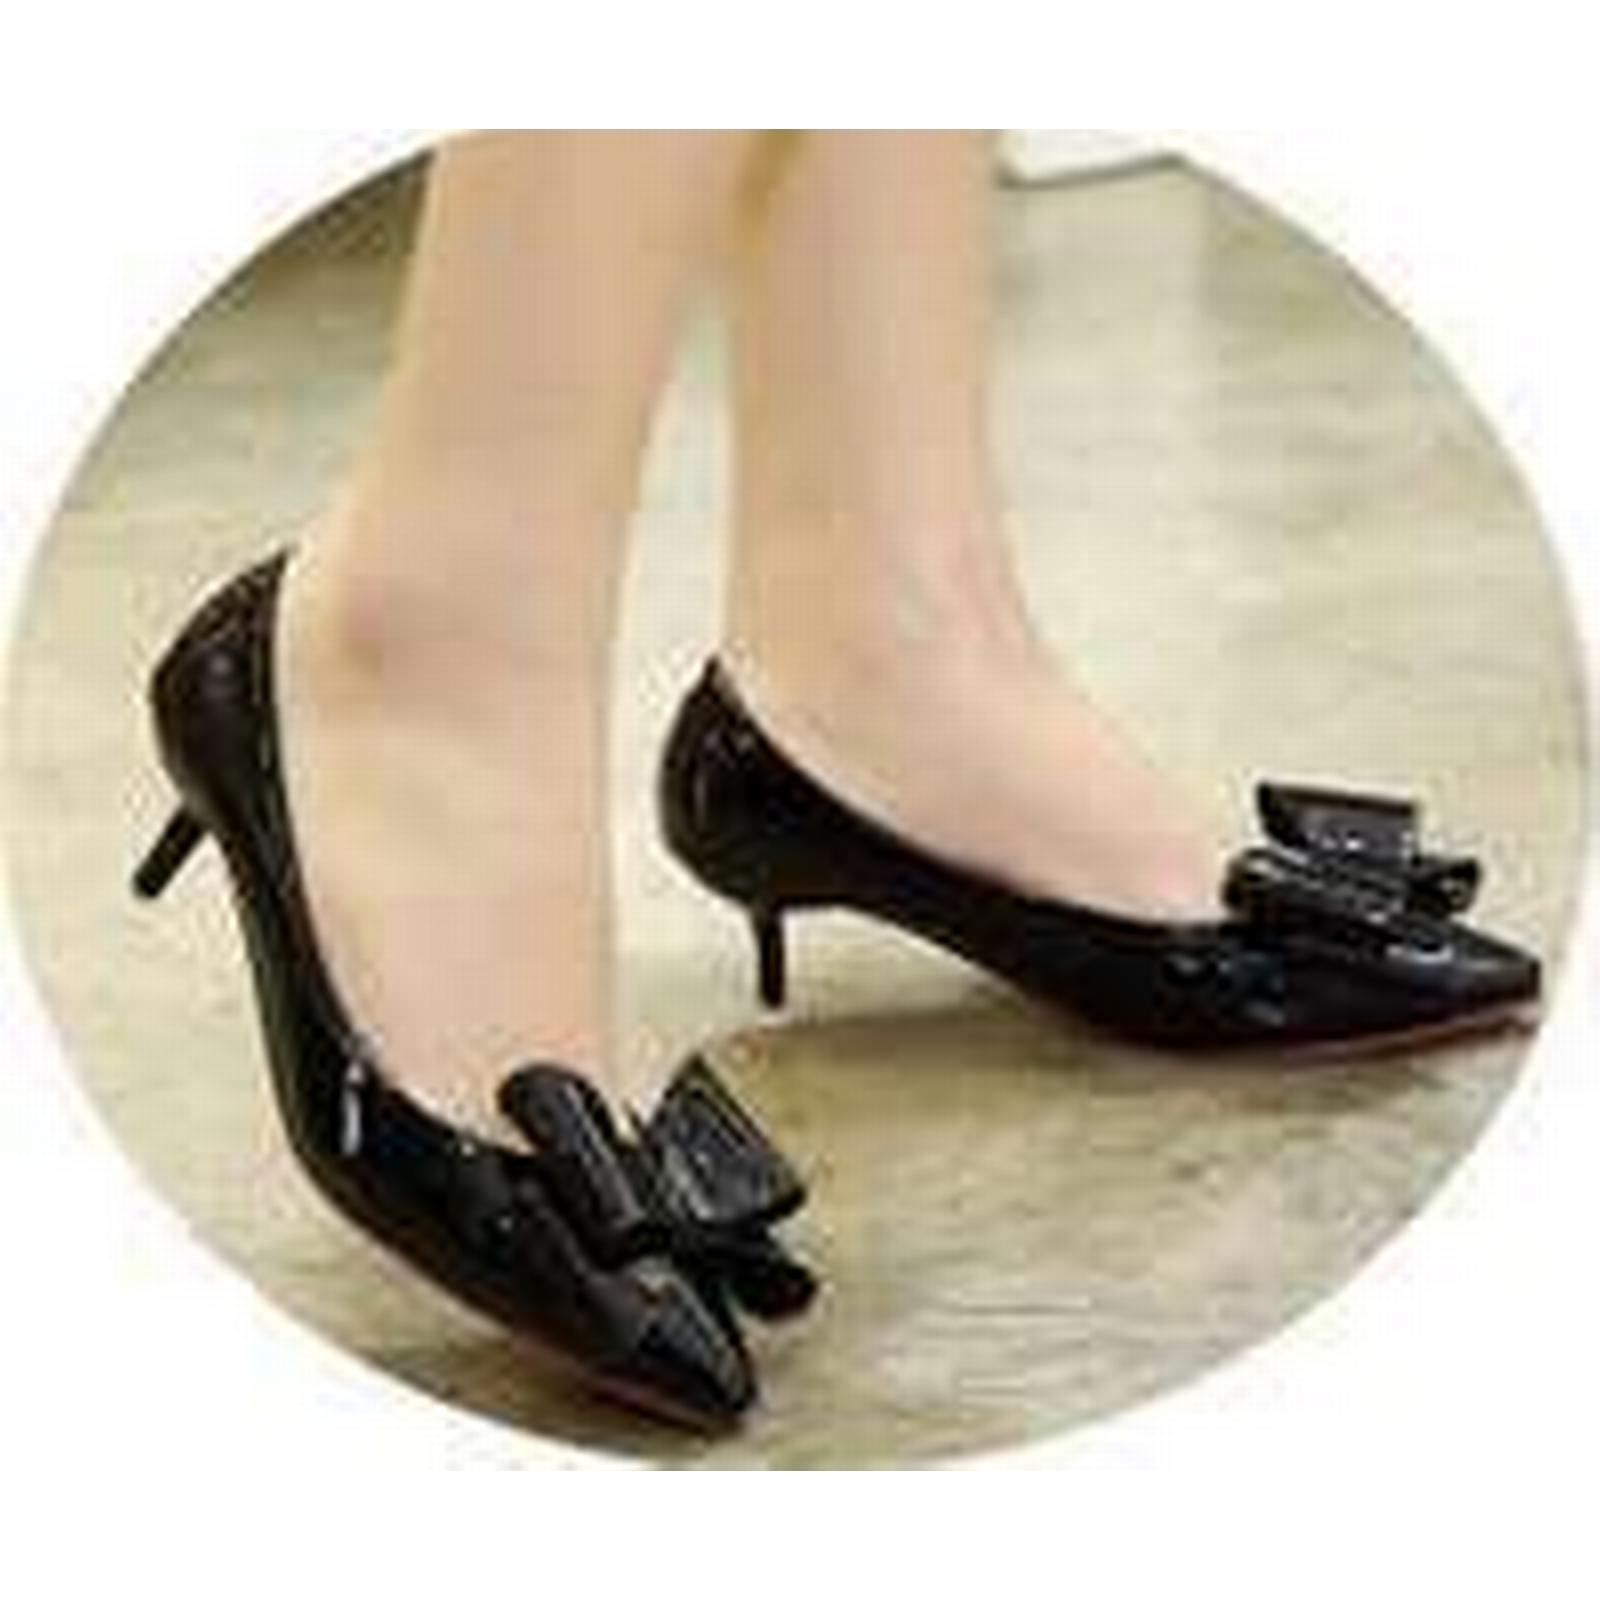 Bonanza (Global) US ps325 elegant bowtie pump, slim heels, US (Global) Size 3-9, black 1049ae